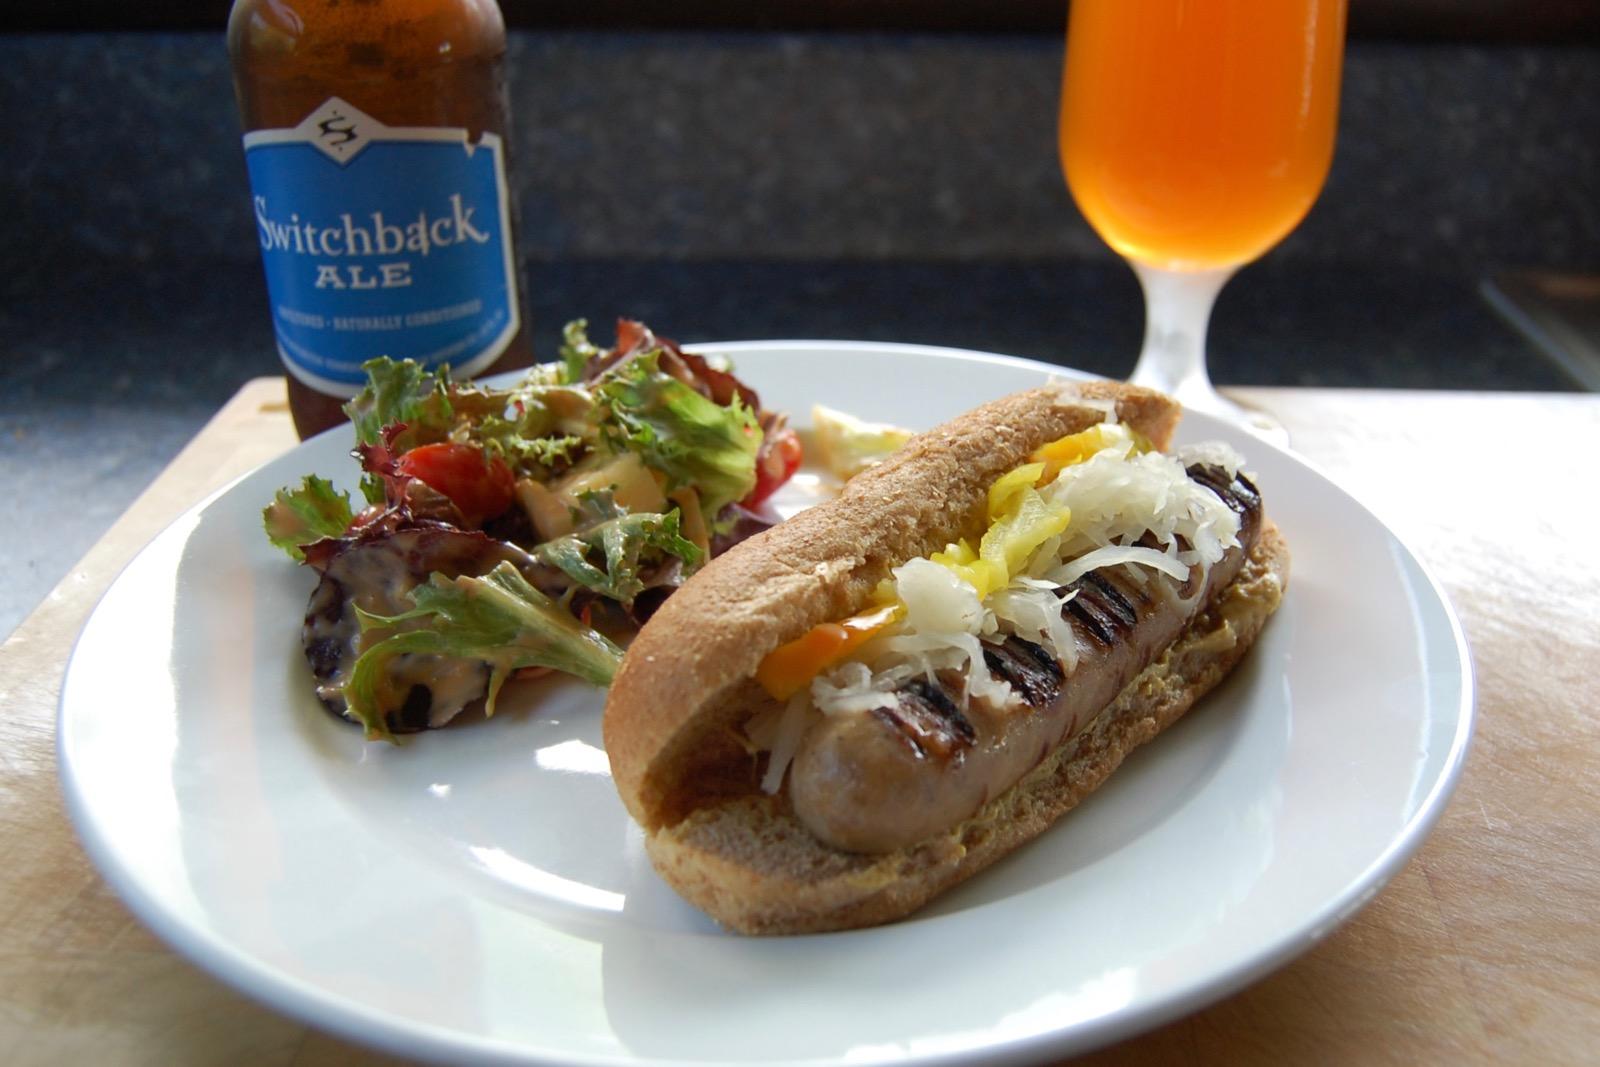 http://blog.rickk.com/food/2018/07/05/ate.2018.07.04.l.jpg